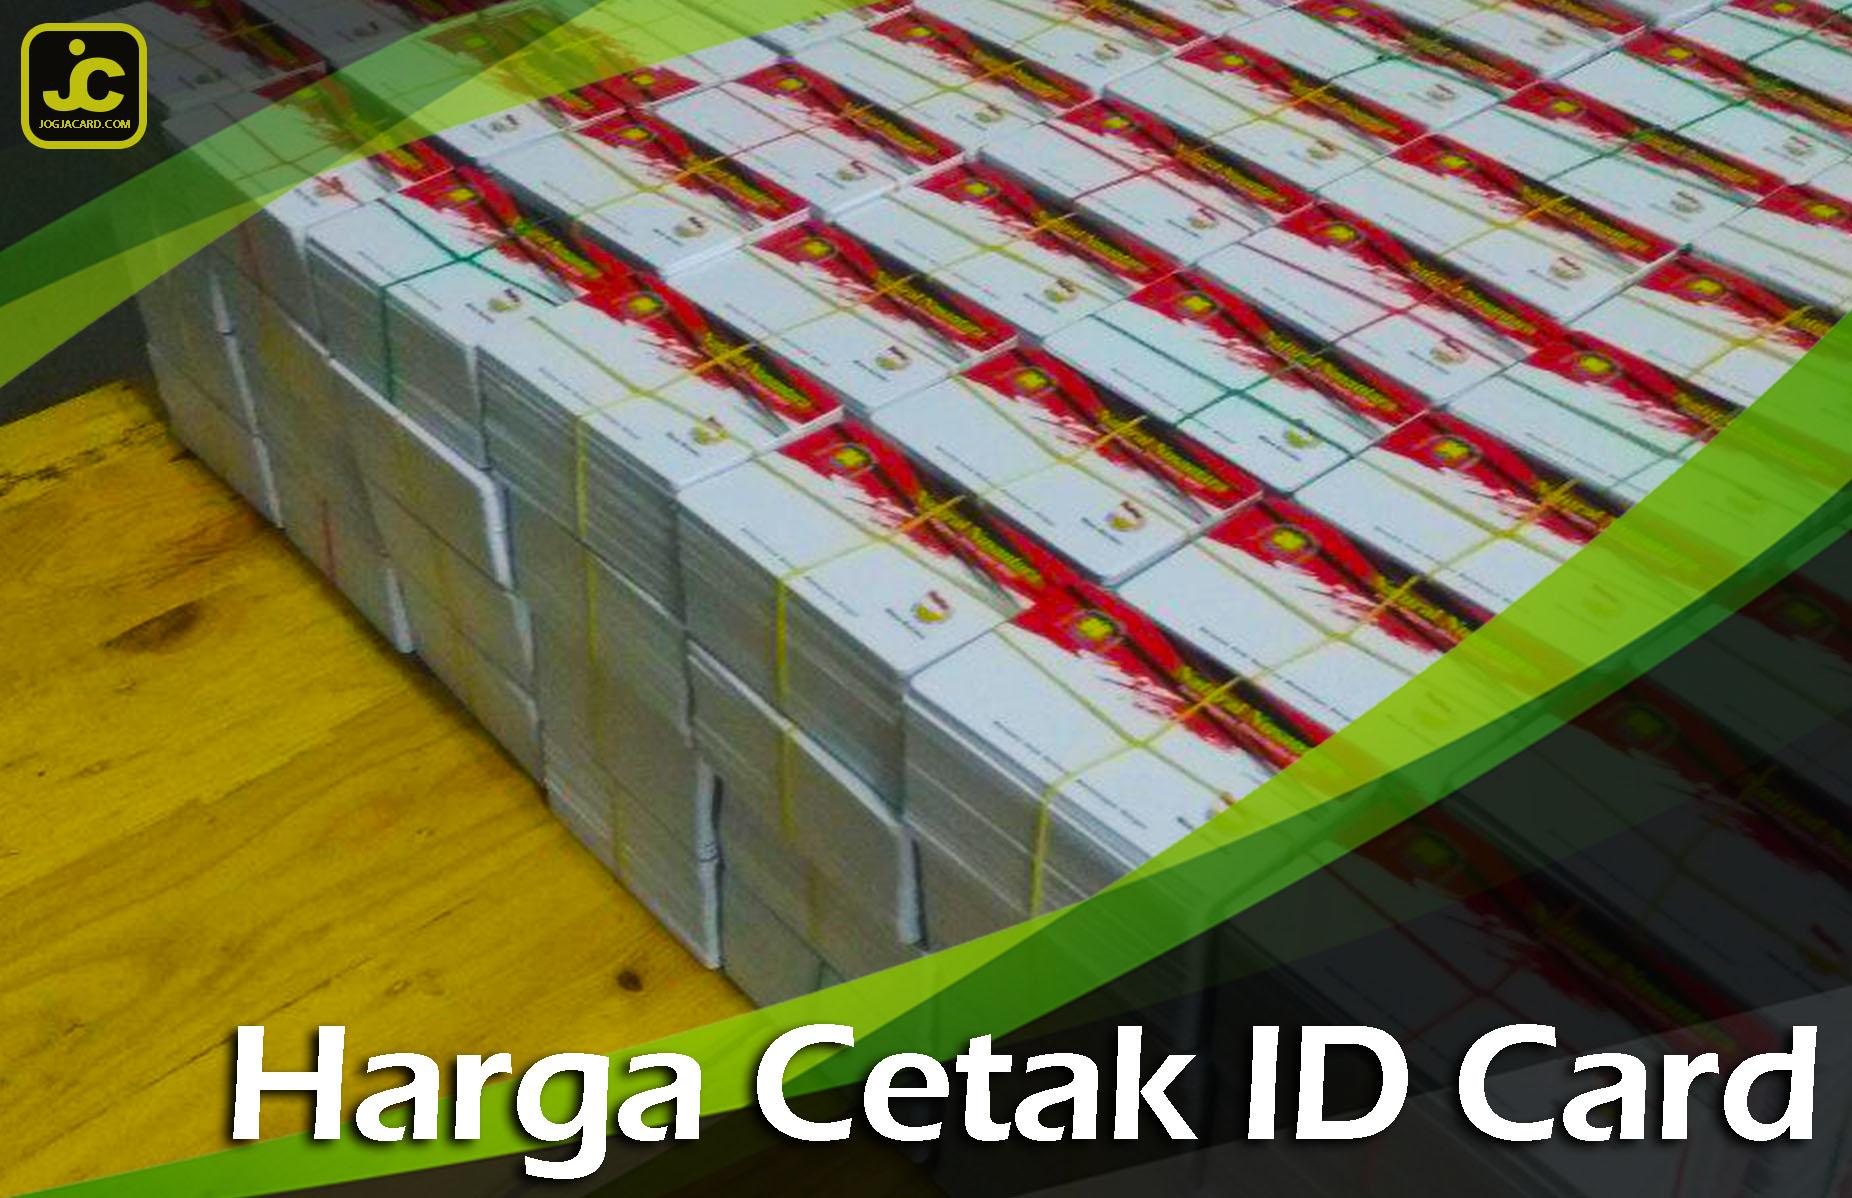 Harga Cetak ID Card